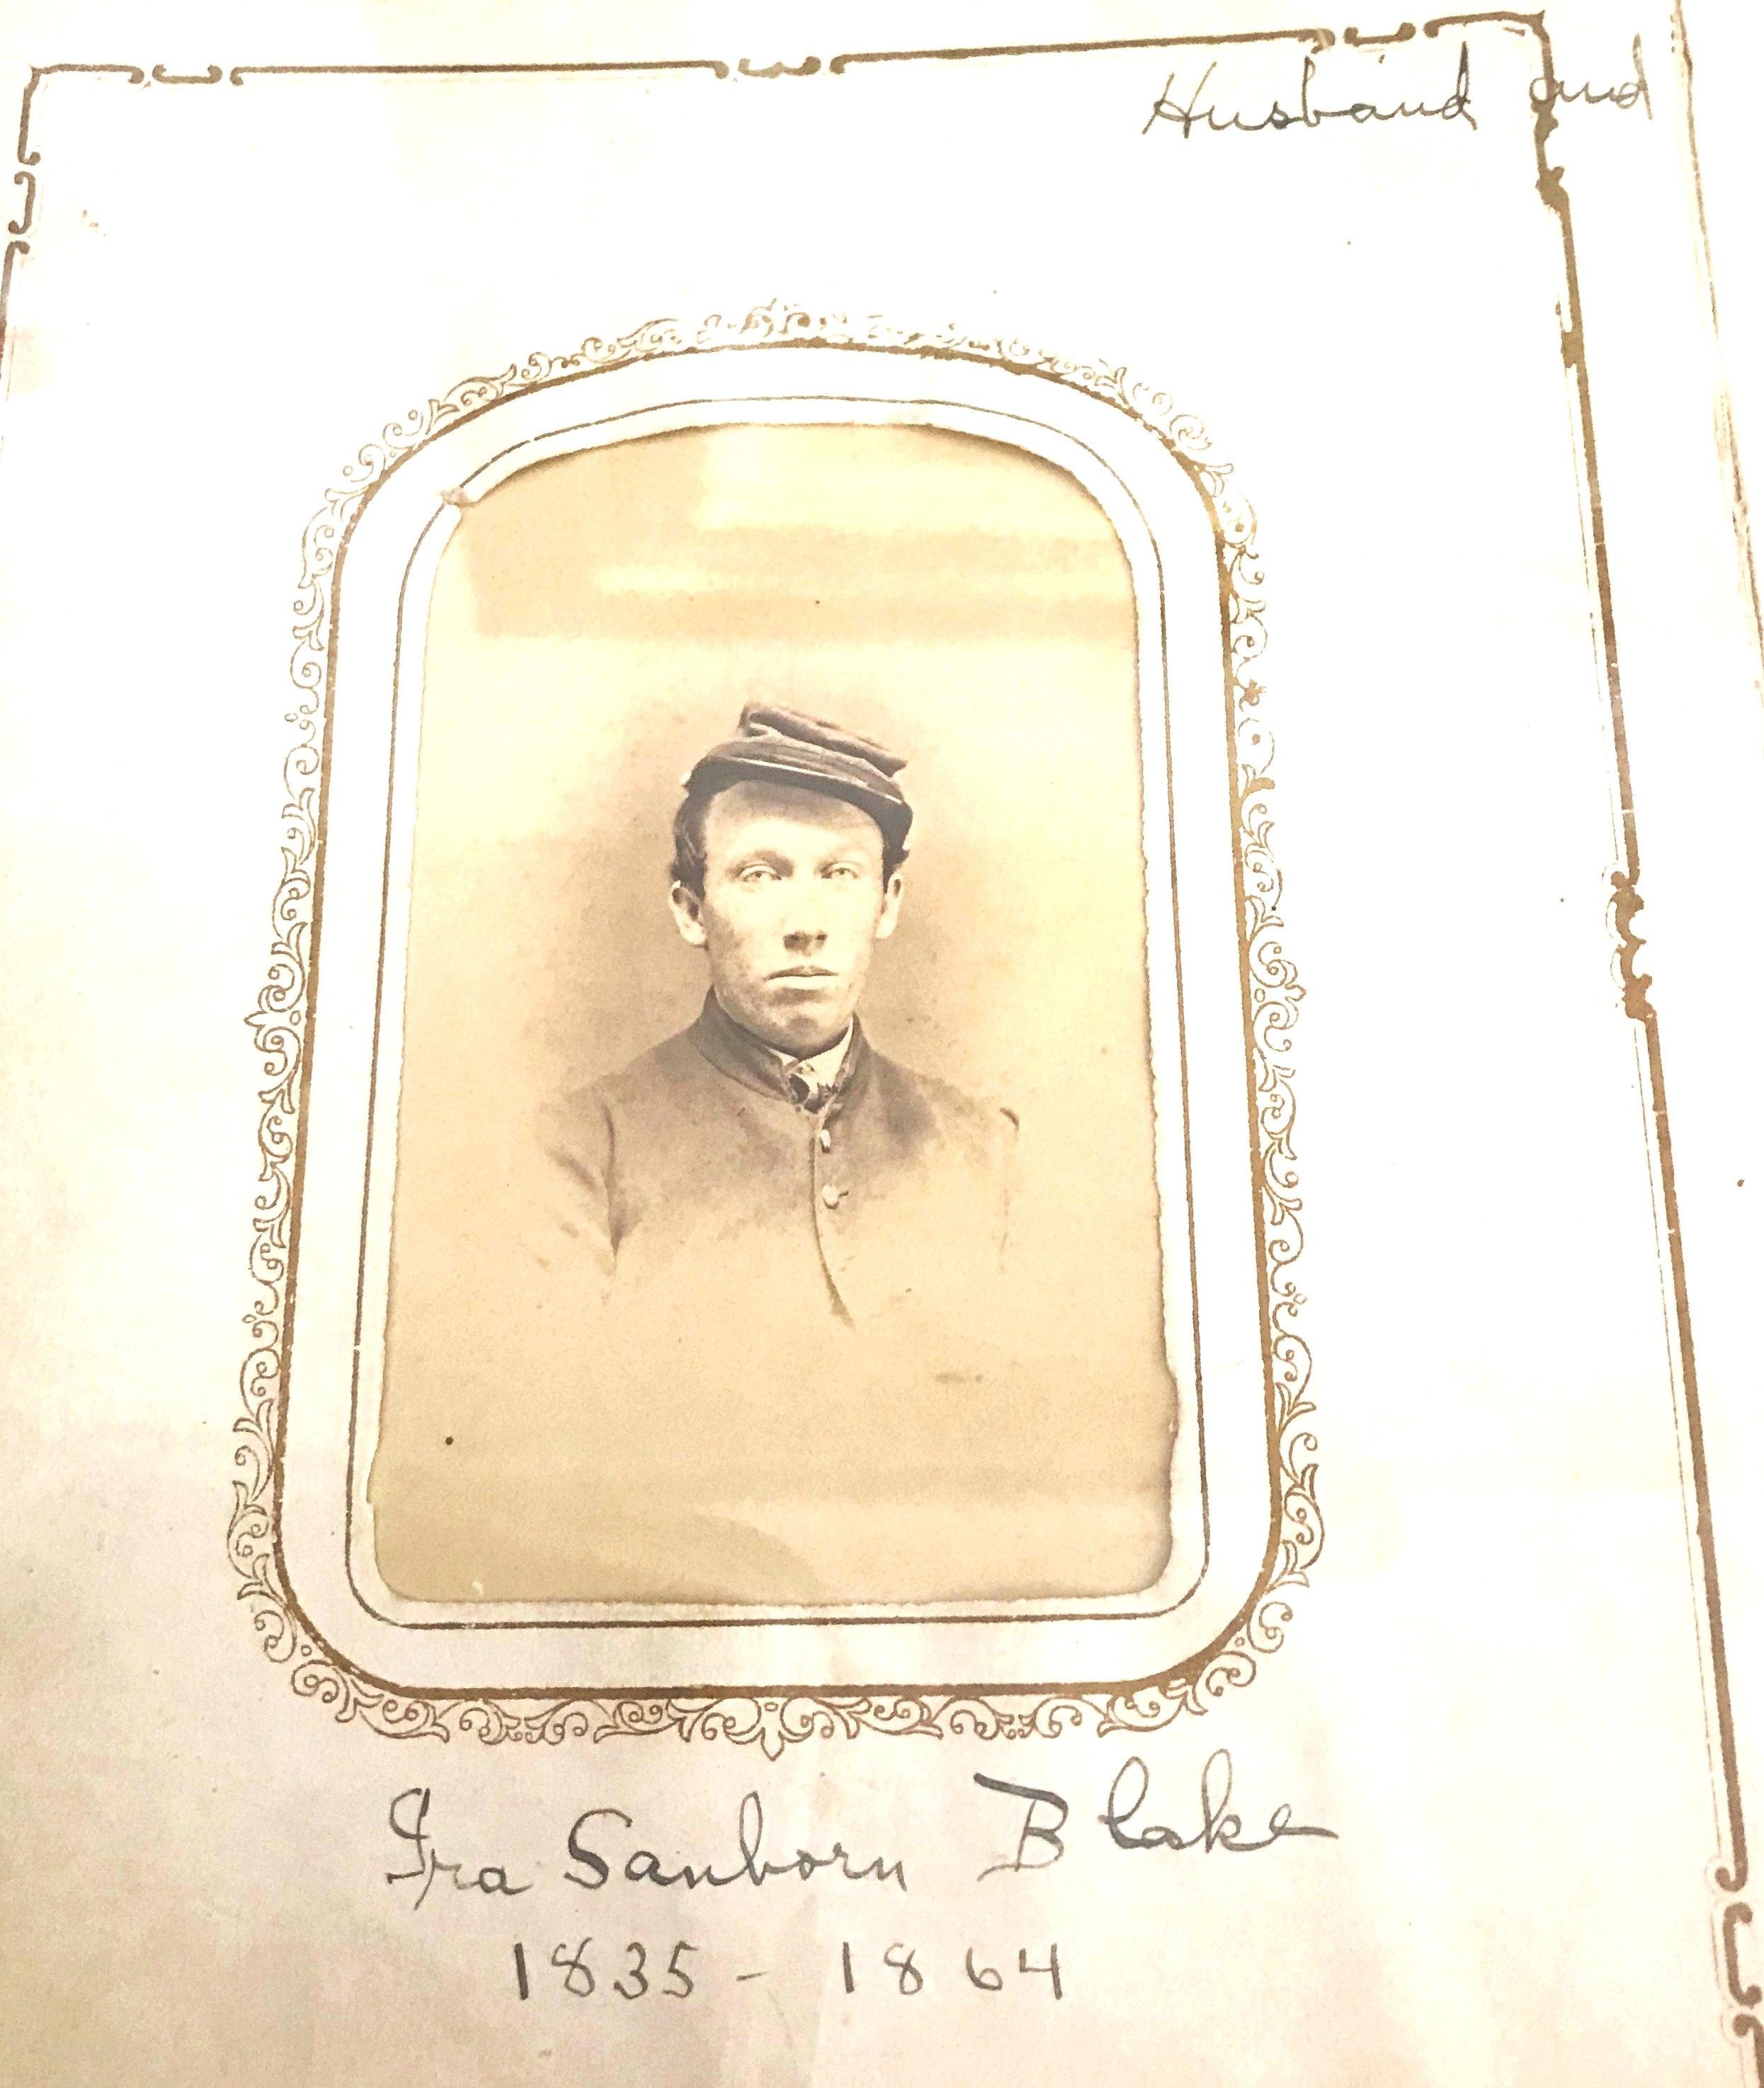 Tamworth resident, Ira Blake, a Civil War soldier.